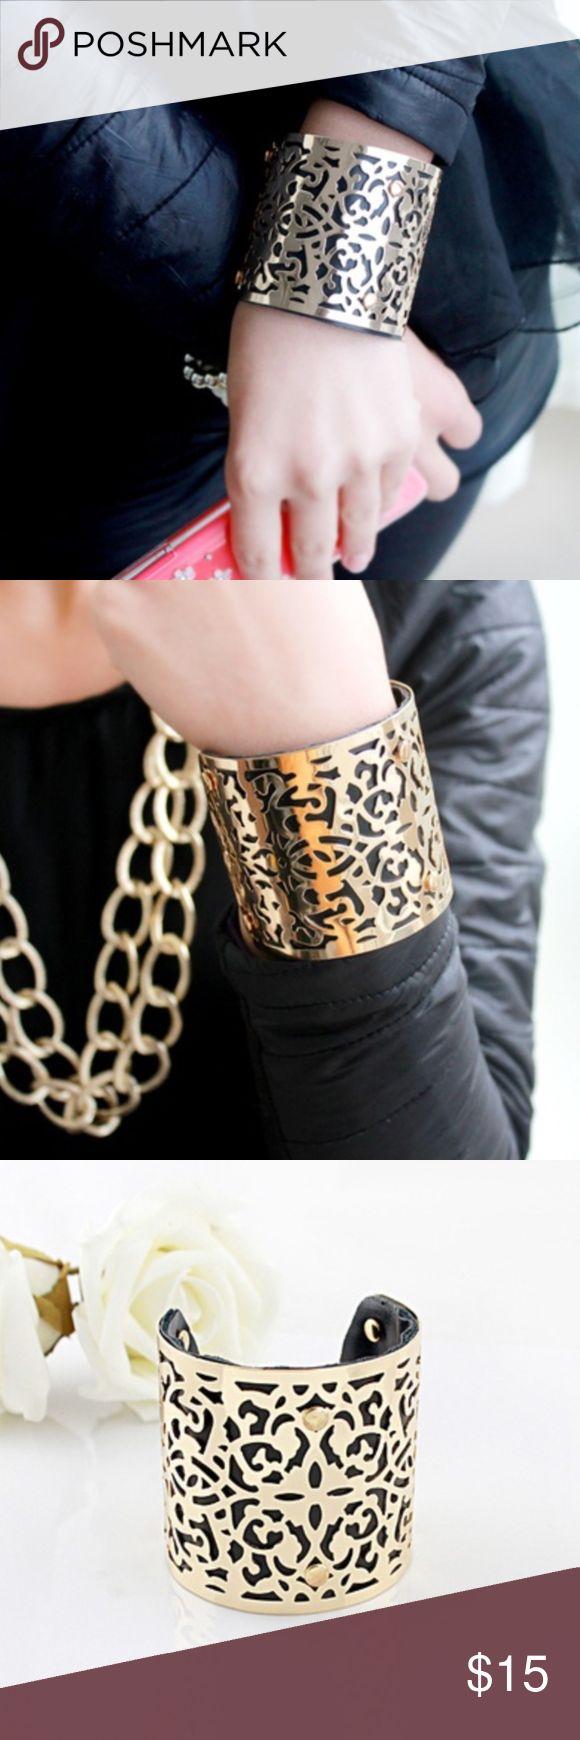 Black & Gold Cuff Bracelet Brand New black and gold laser cut cuff bracelet. Jewelry Bracelets